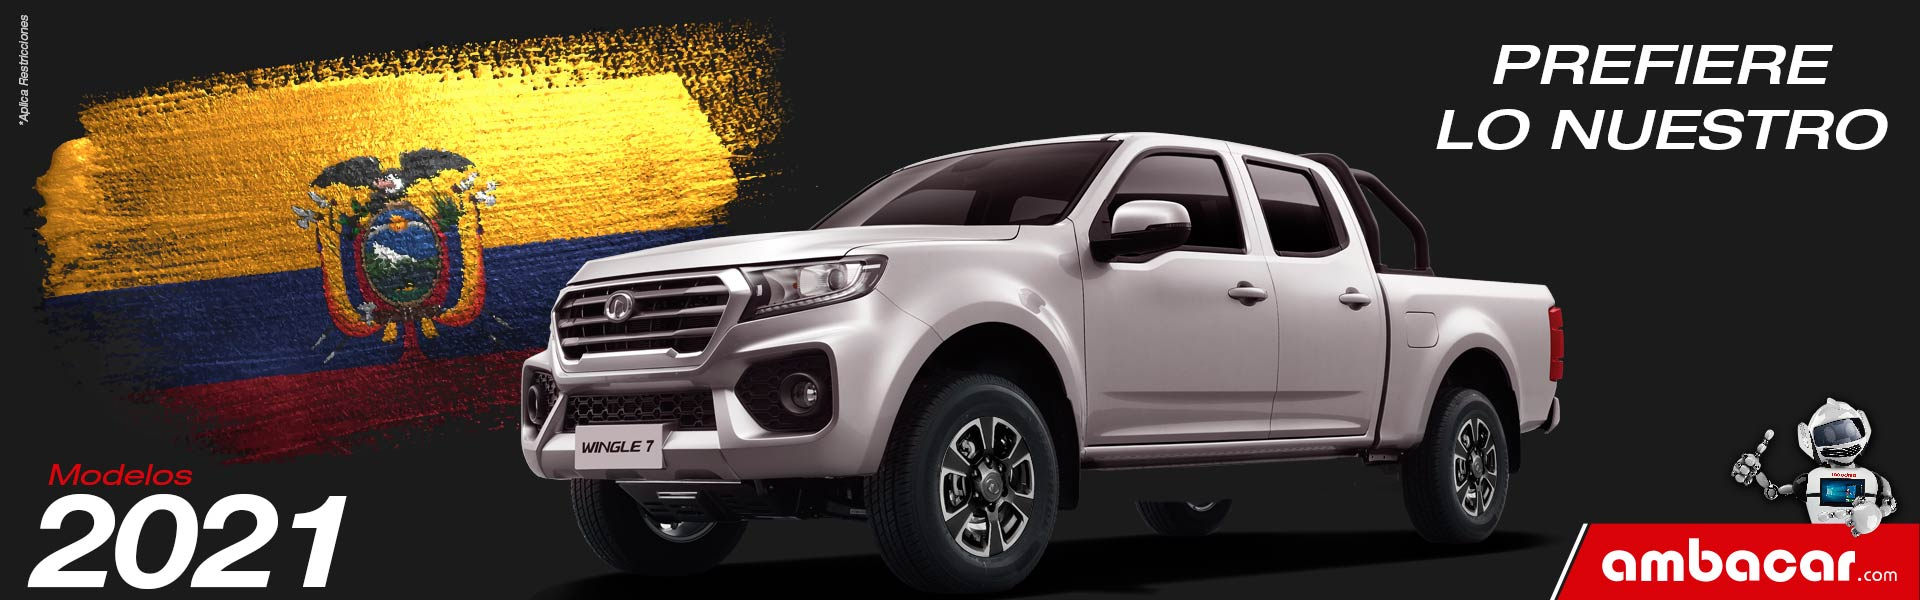 Modelos Ambacar año 2021 Camioneta Great Wall Wingle 7